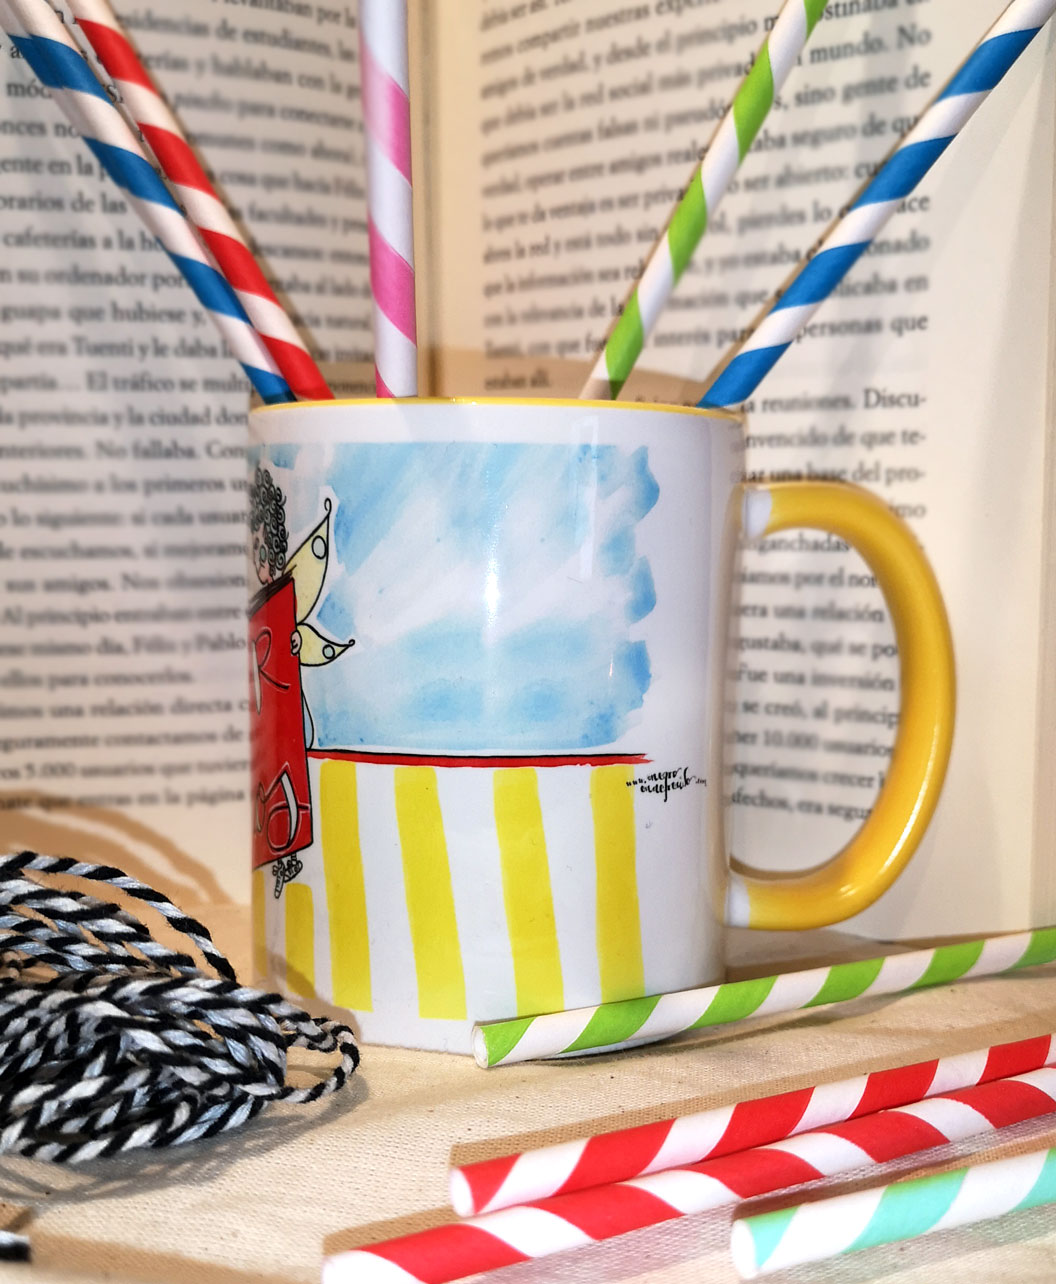 taza original bonita ideal regalo lectura libros leer da suenos